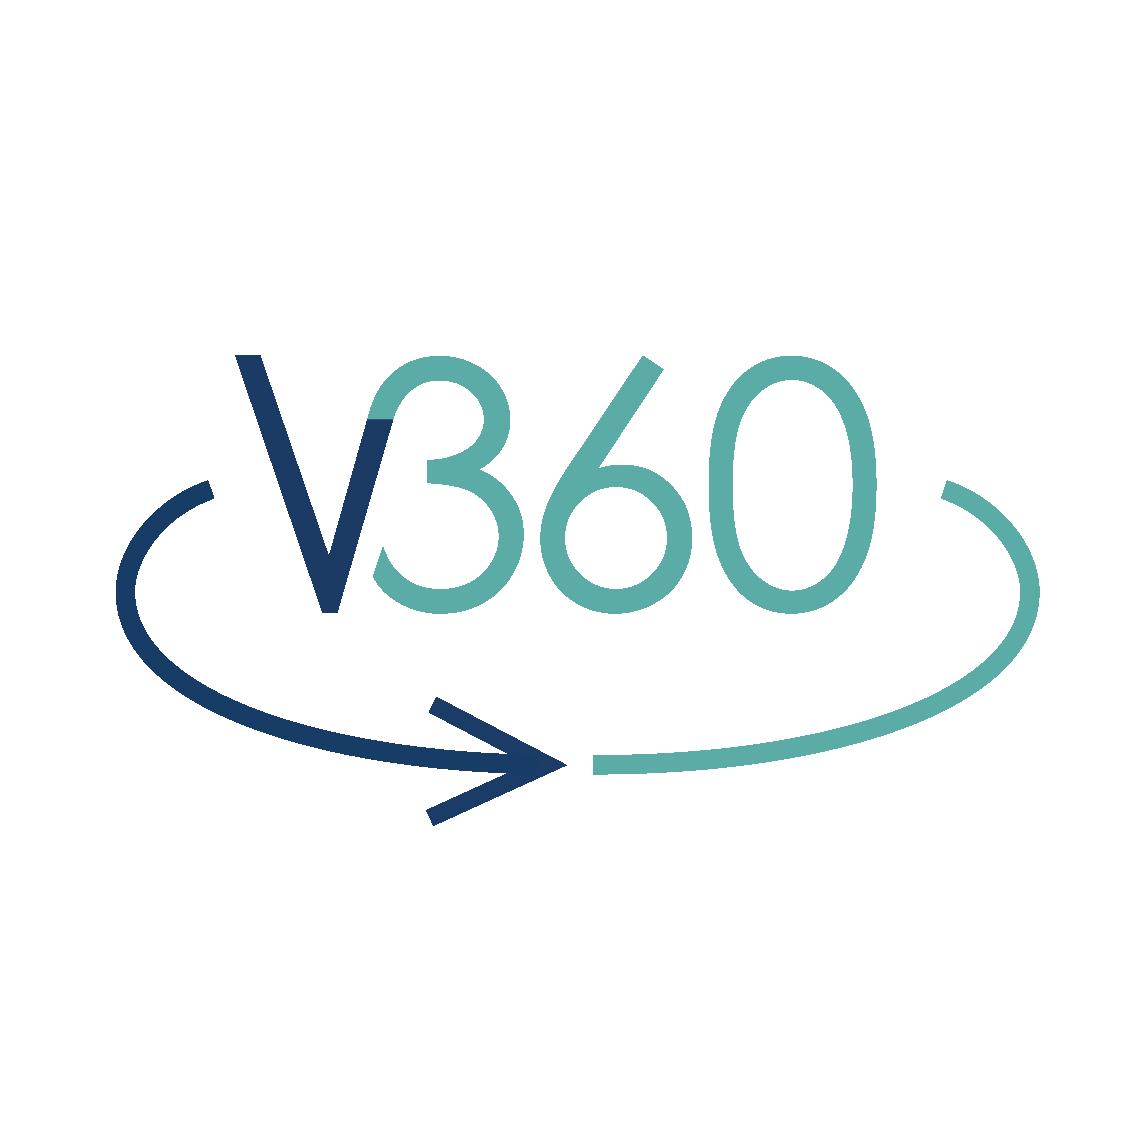 v360support | Virtuele Ondersteuning